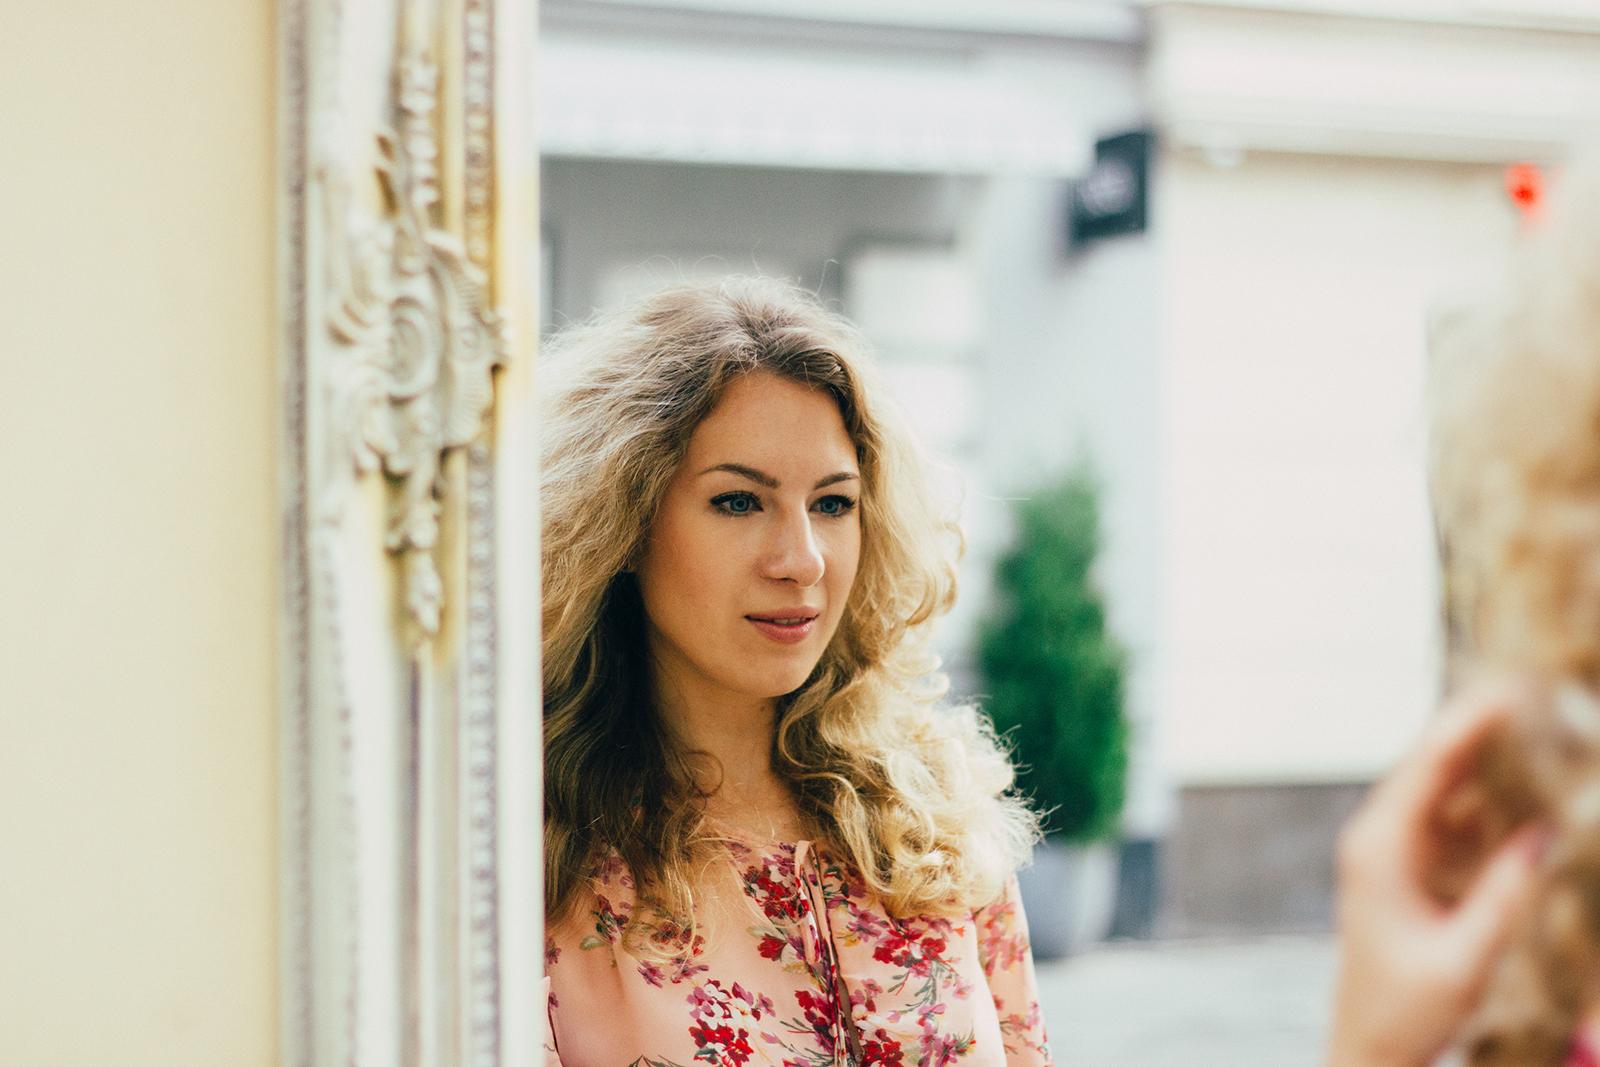 Margarita Maslova Ritalifestyle Fashion blogger Moscow Romantic style sport chic Pastel looks